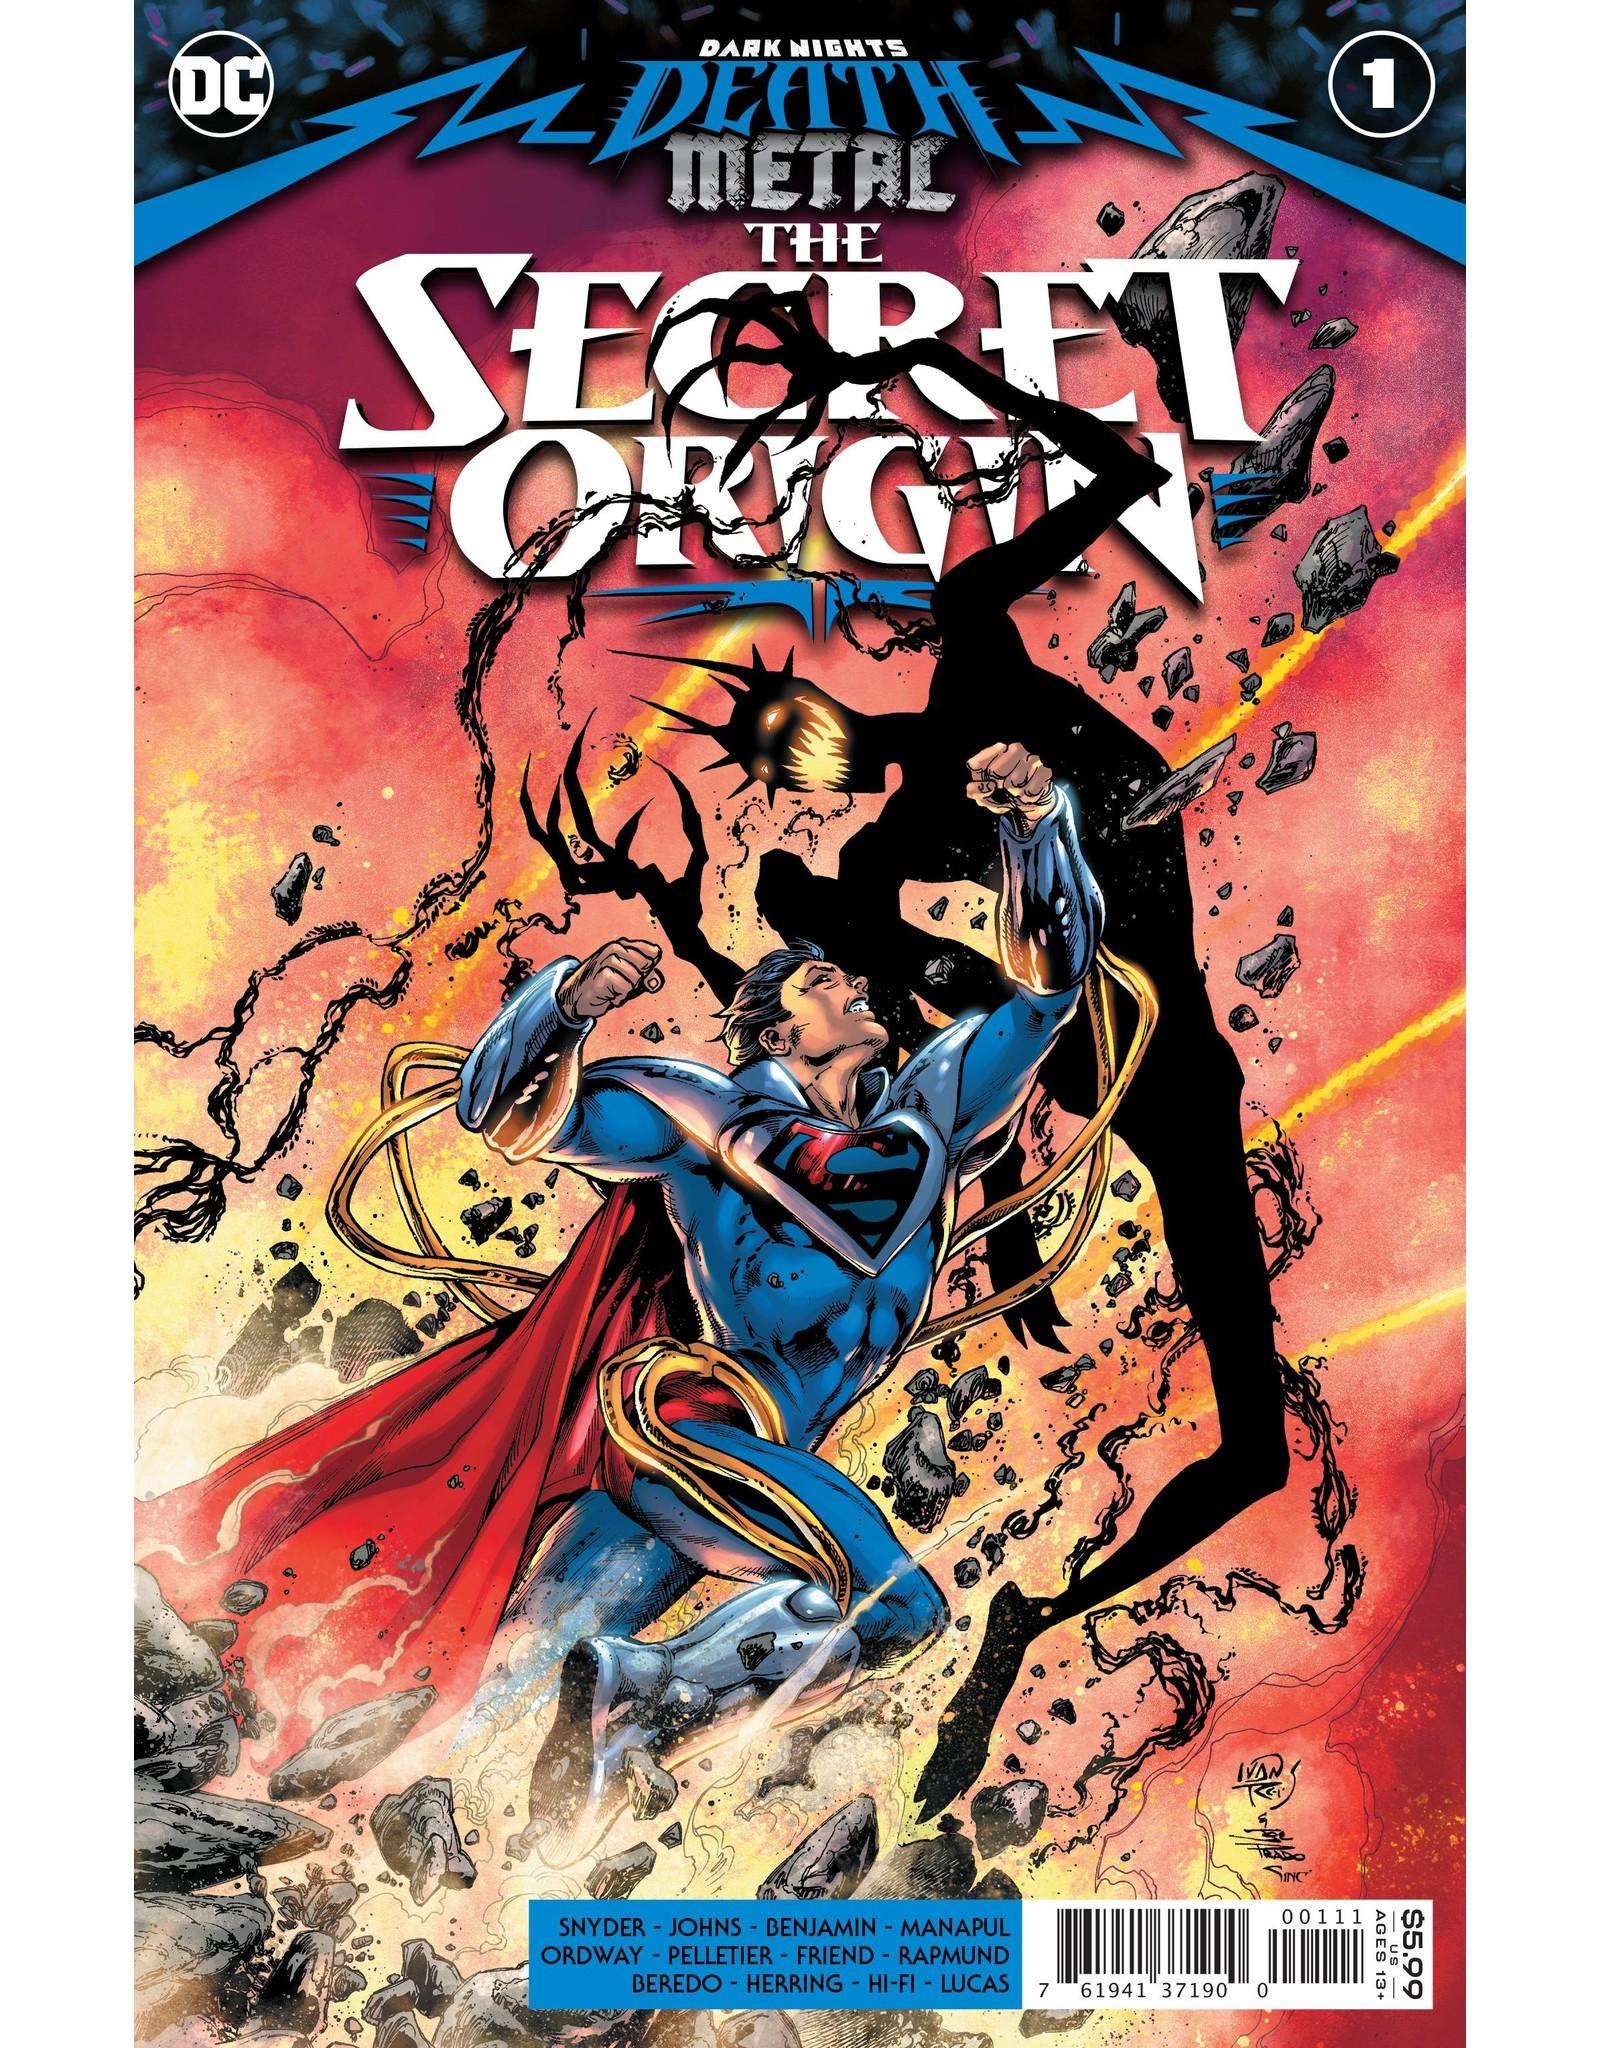 DC COMICS DARK NIGHTS DEATH METAL THE SECRET ORIGIN #1 (ONE SHOT) CVR A IVAN REIS & JOE PRADO